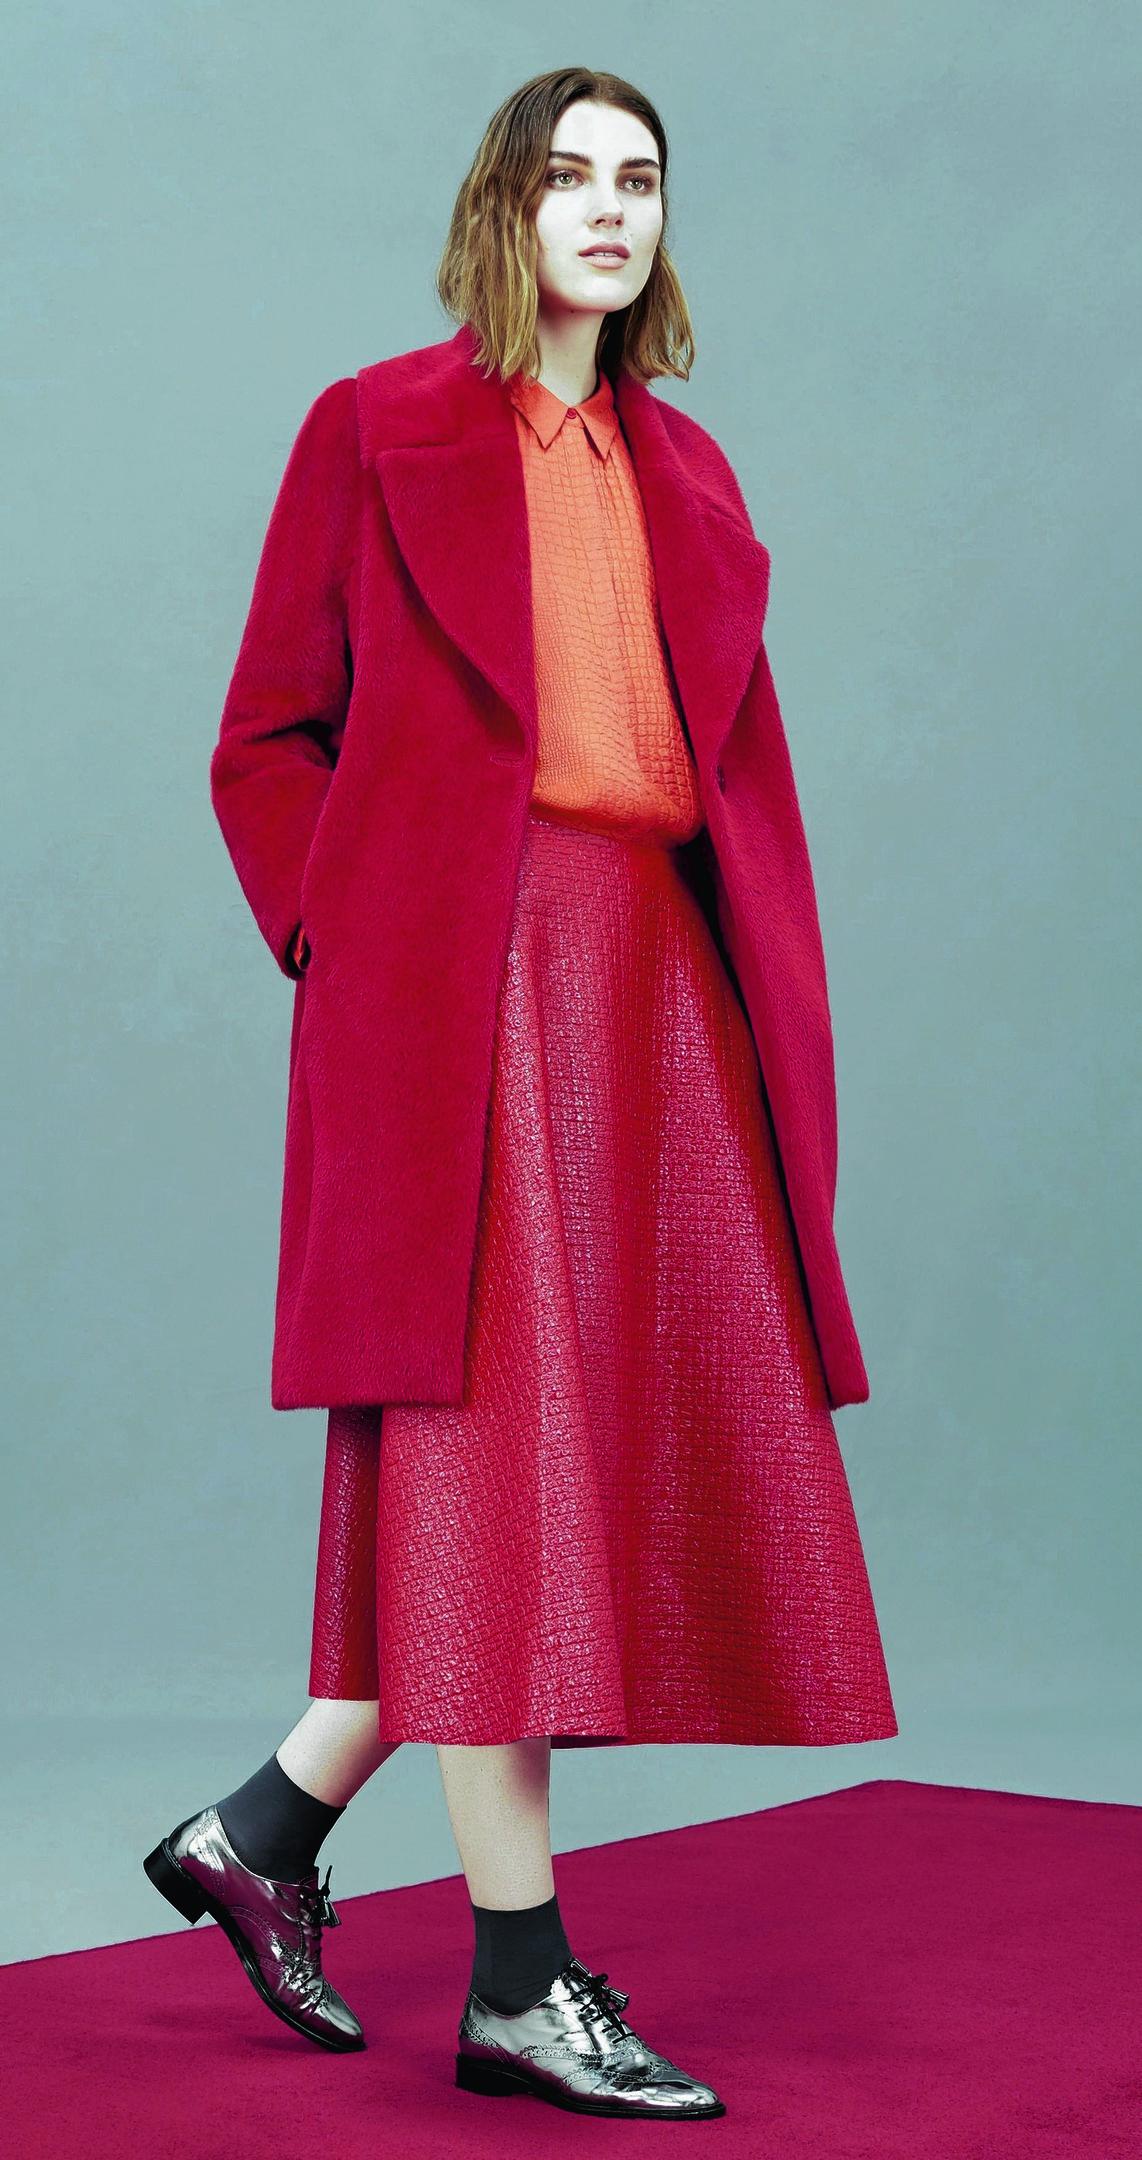 Teddy coat,£499; animal jacquard shirt, £119; laminated tweed skirt, £169; Agatha brogues, £179; all Hobbs